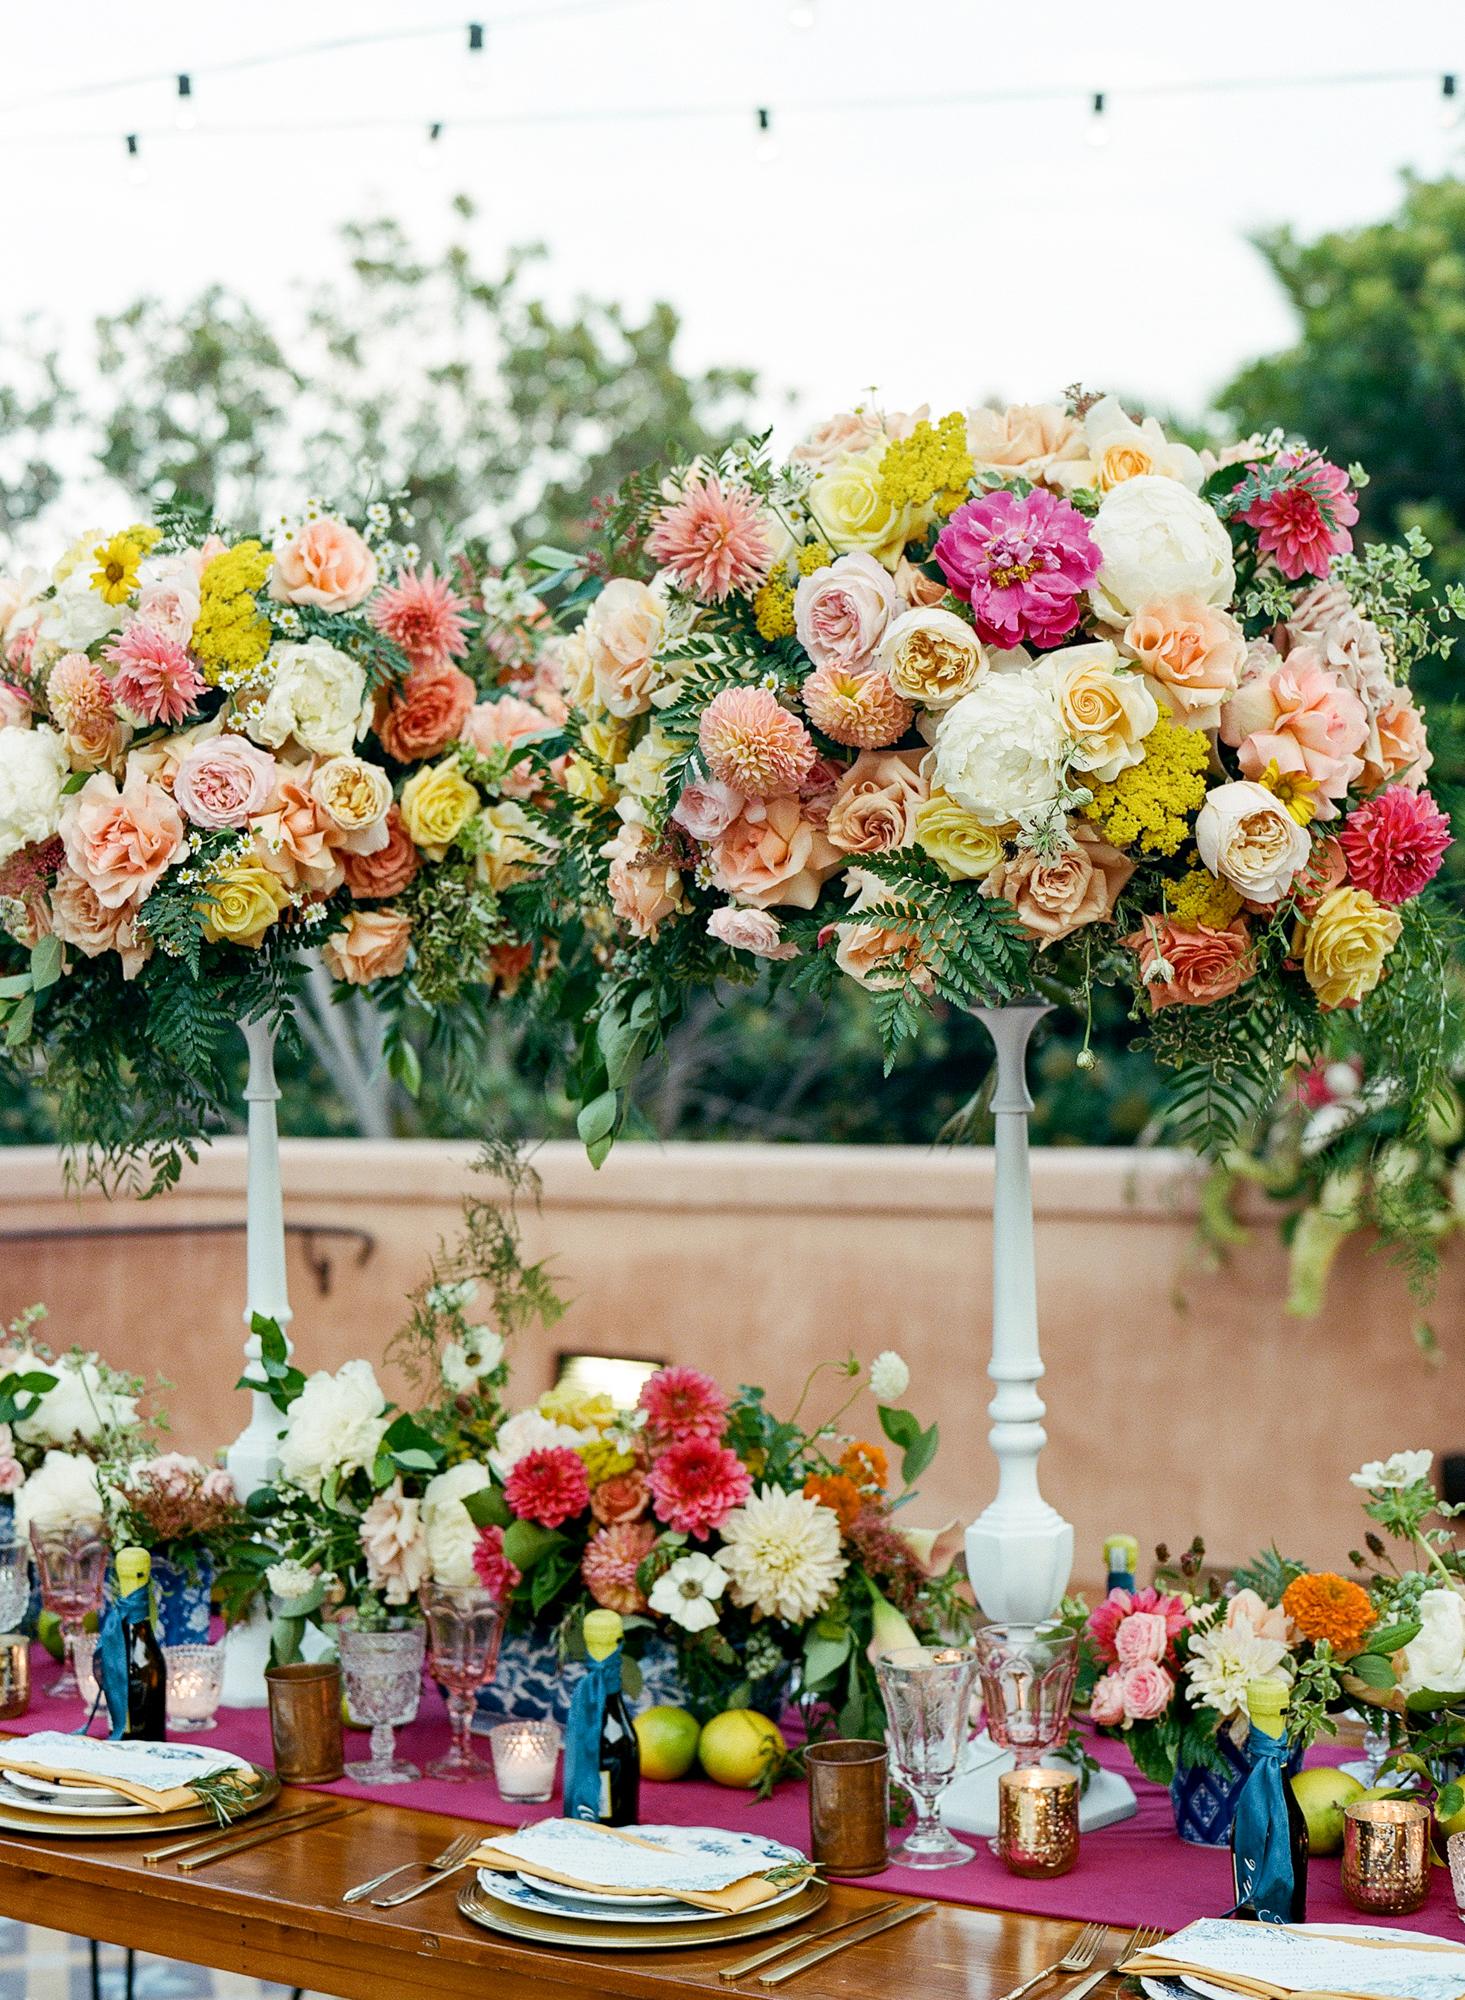 Rancho-Valencia-wedding-blooms-by-breesa-lee-rochelle-cheever-francine-ribeau-luxury-garden-rancho-santa-fe-hey-there-cupcake-adore-folklore-496.JPG